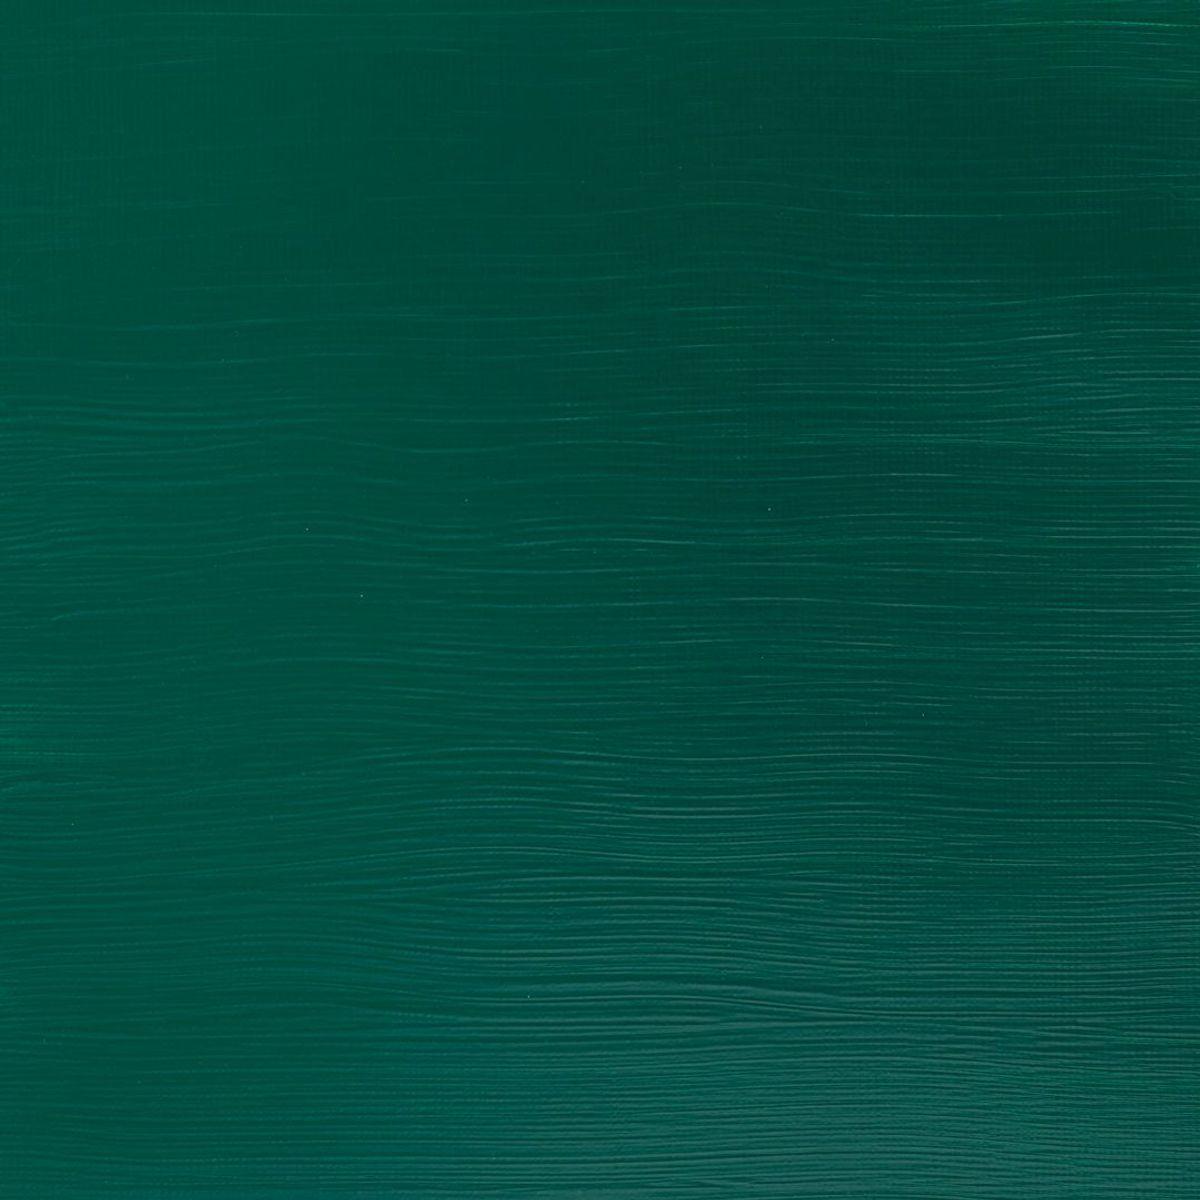 WINSOR AND NEWTON GALERIA ACRYLIC COLOUR - TUBE OF 60 ML - PERMANENT GREEN DEEP (482)